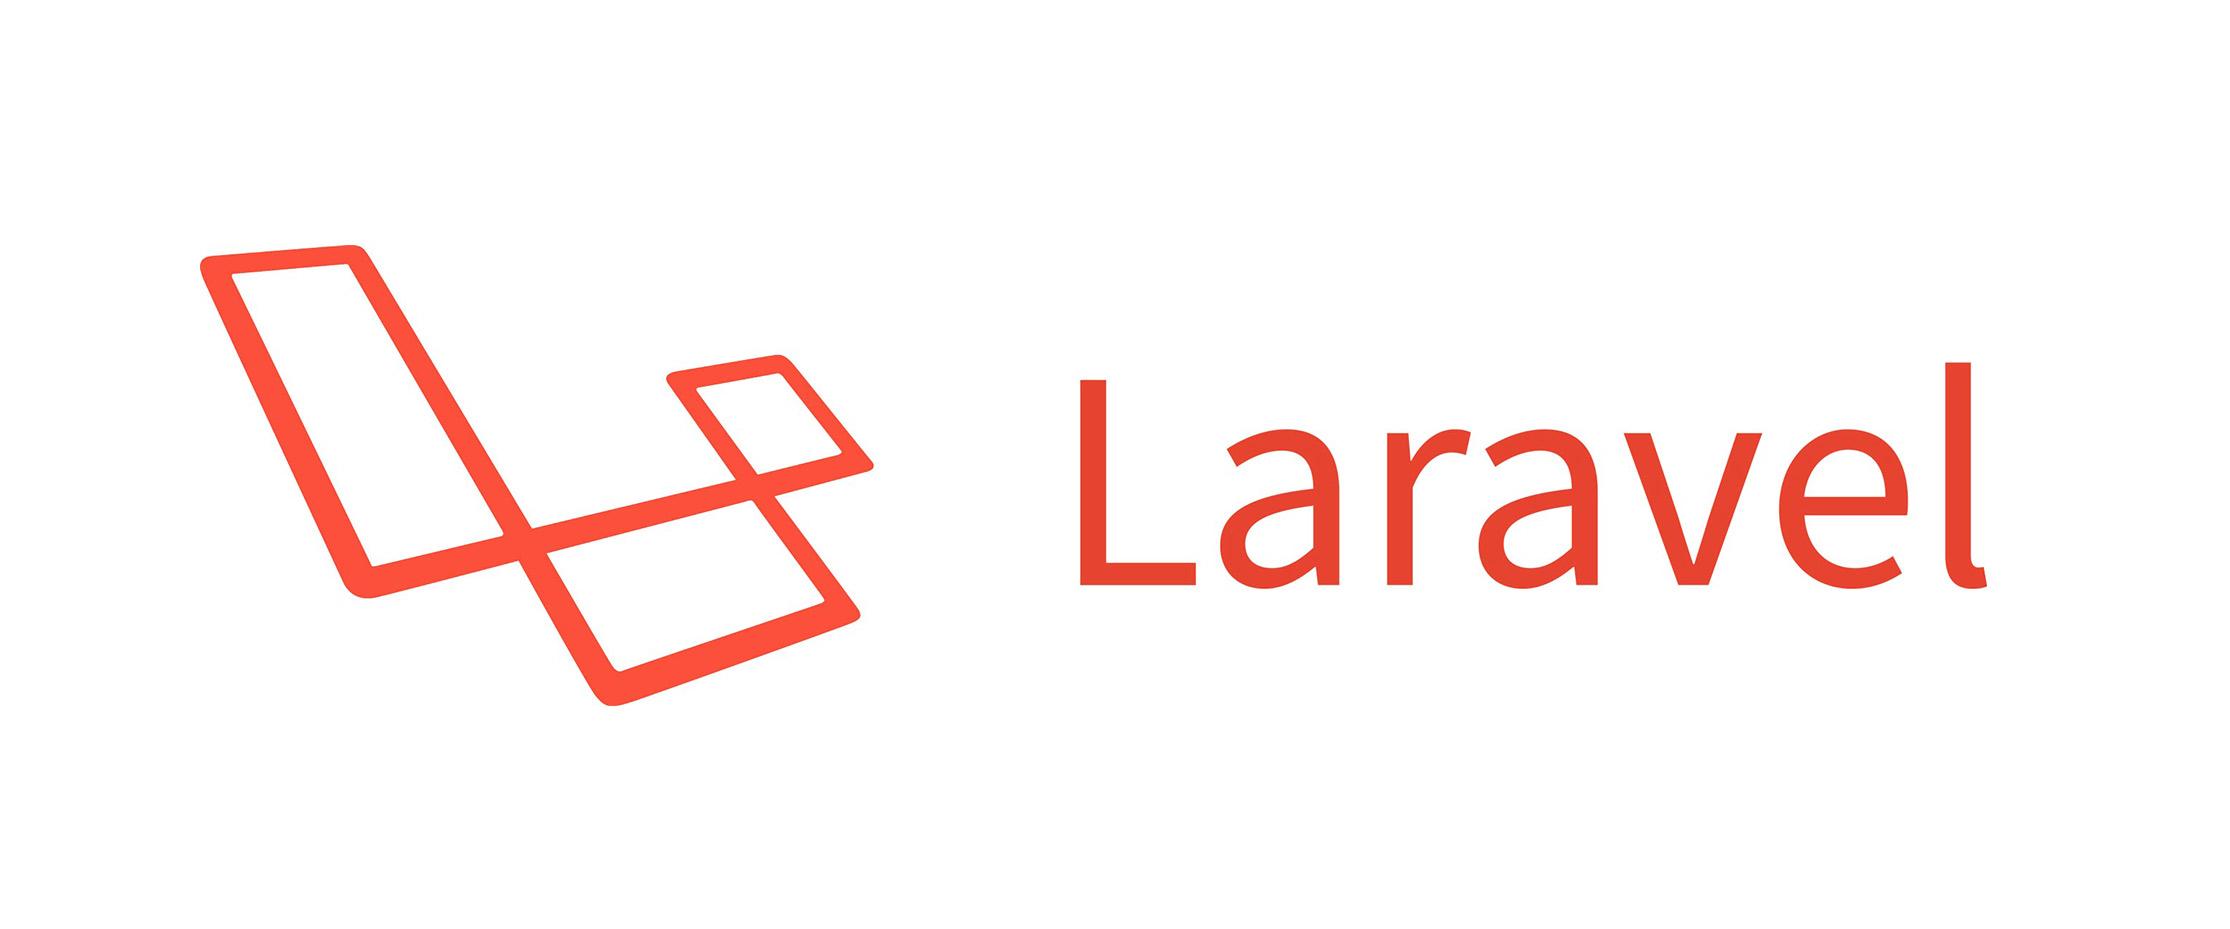 Hire Laravel Freelancer